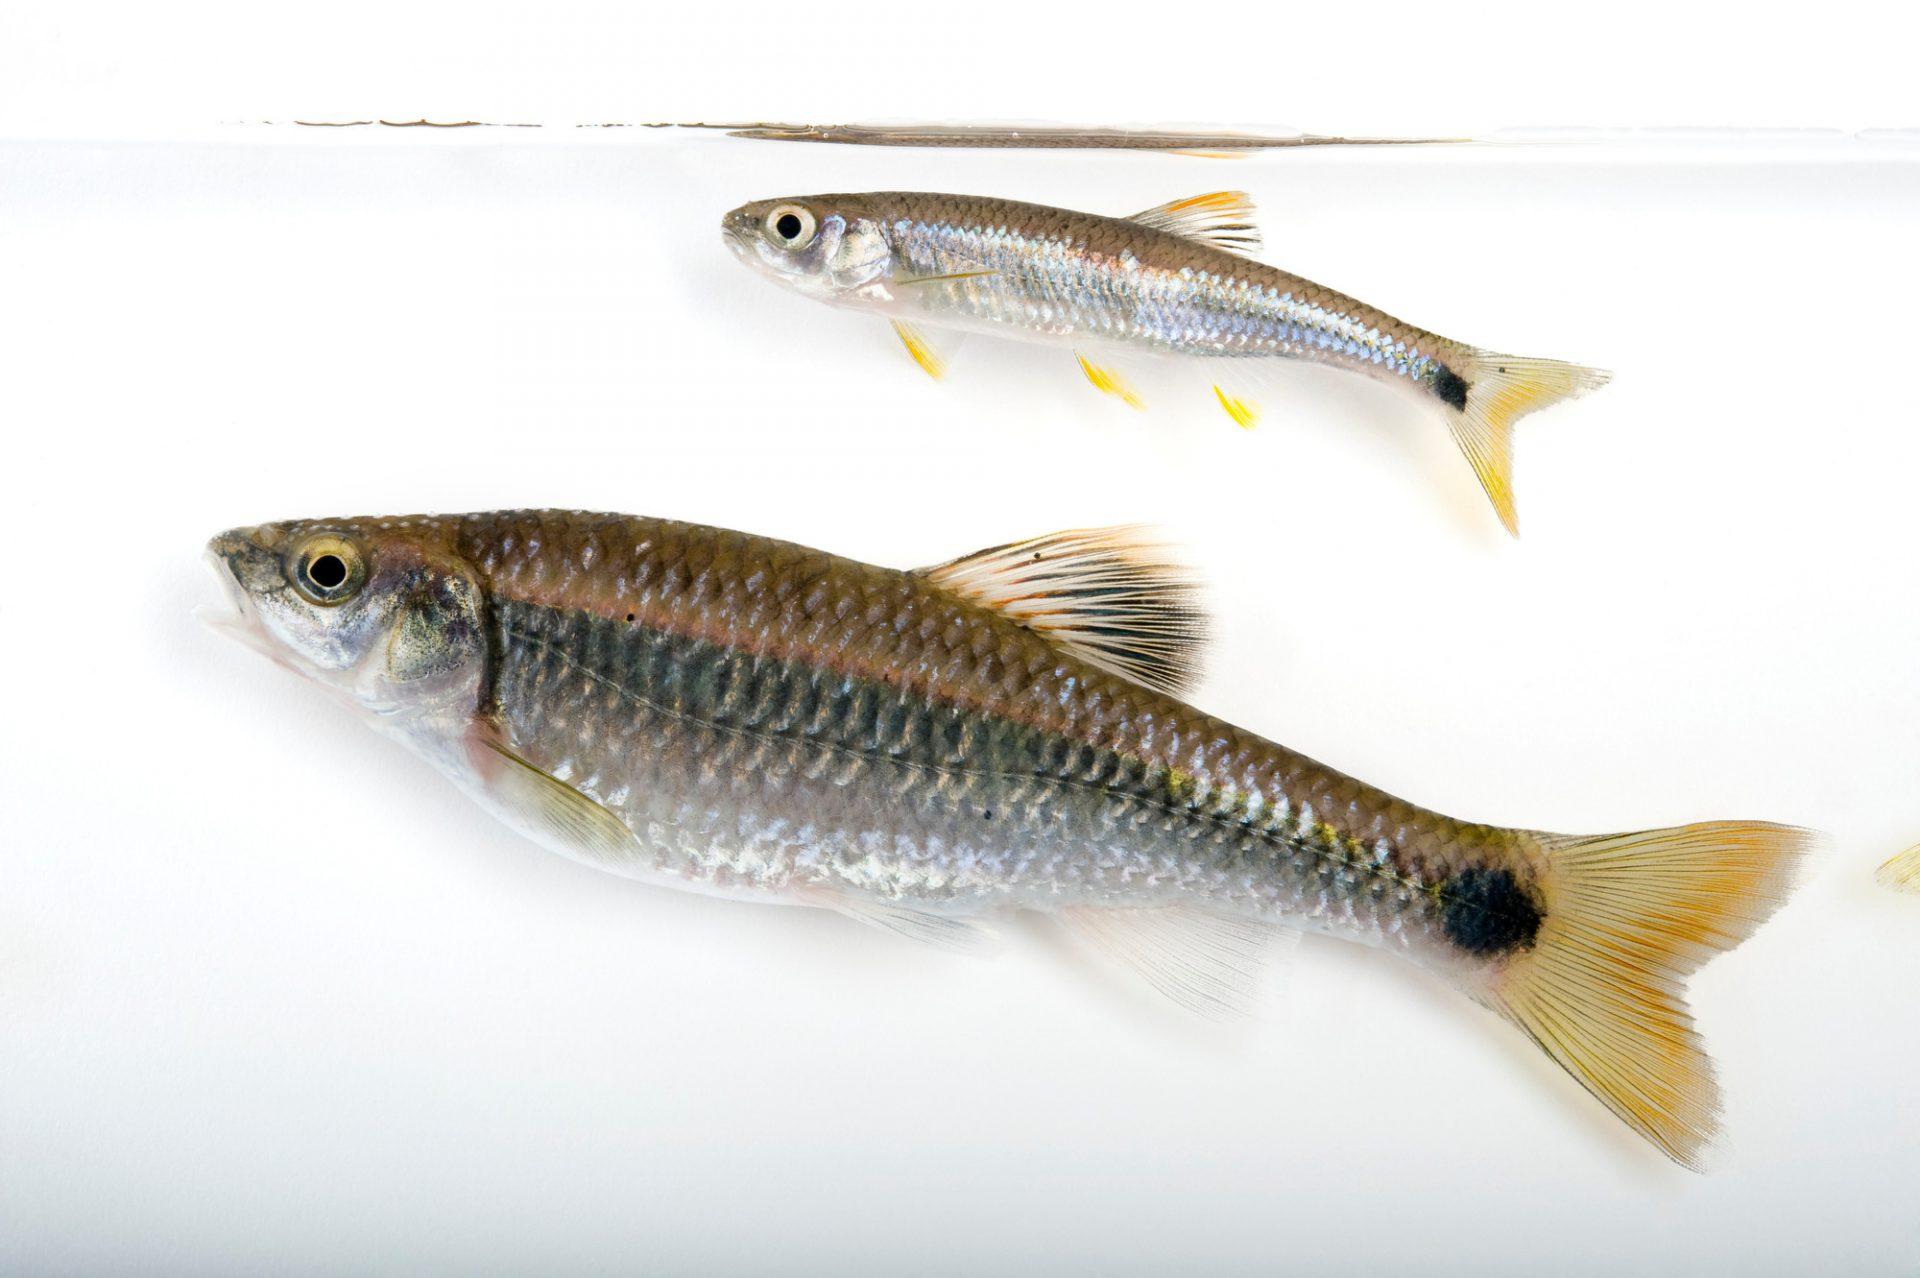 Tricolor shiners (Cyprinella trichroistia) taken from the Conasauga River near Conasauga, Tenessee.